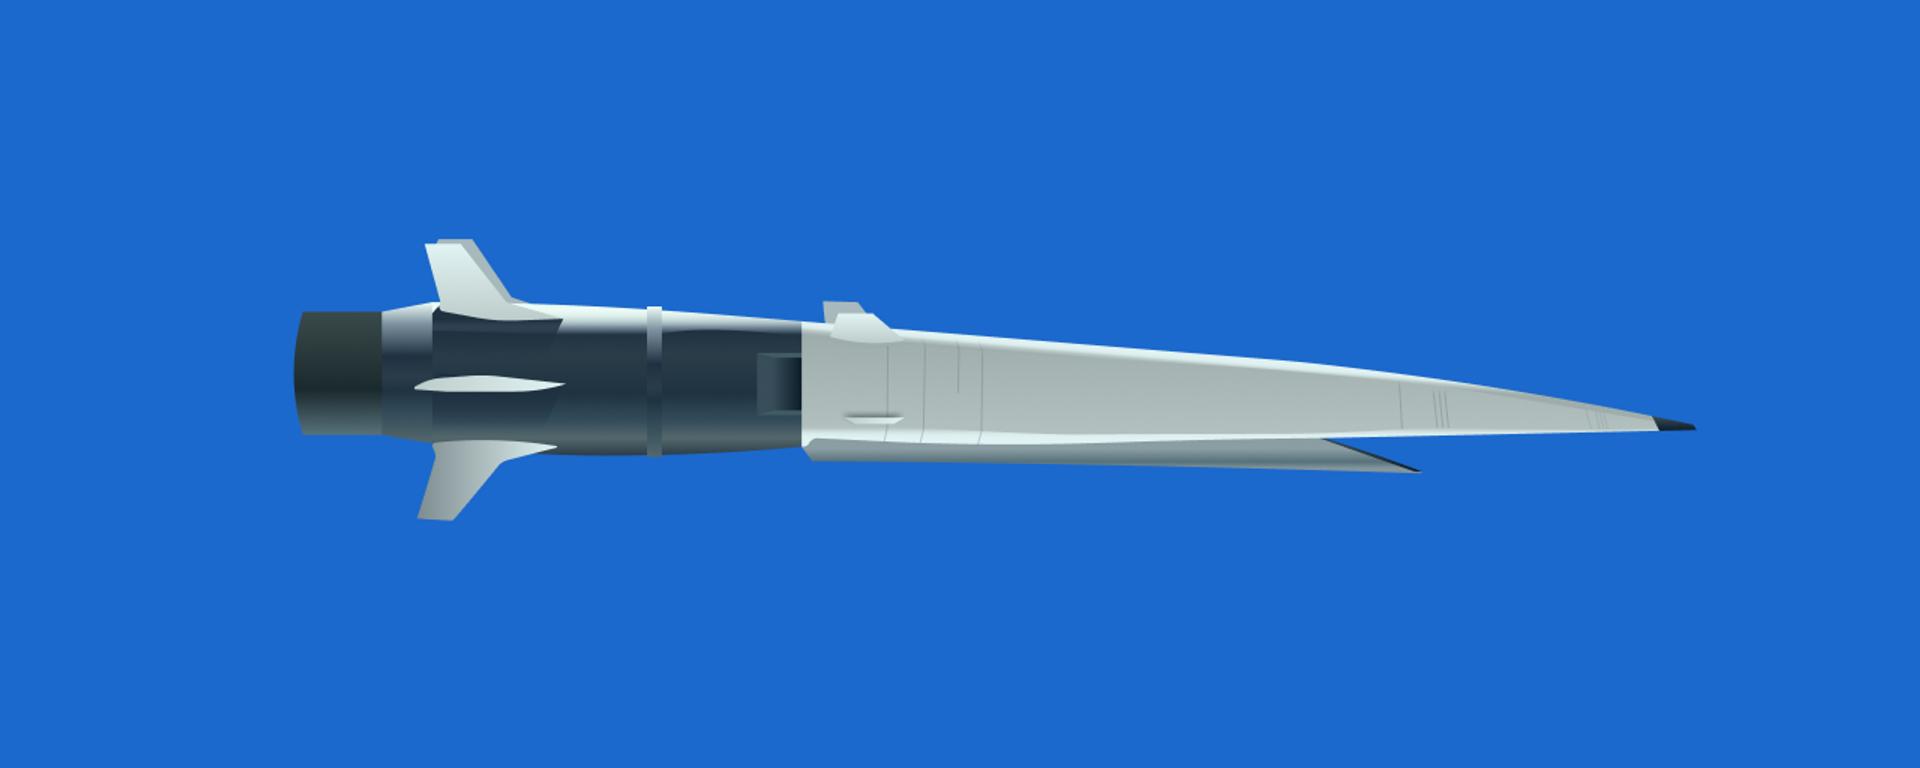 Misil de crucero hipersónico ruso Tsirkon - Sputnik Mundo, 1920, 20.07.2021